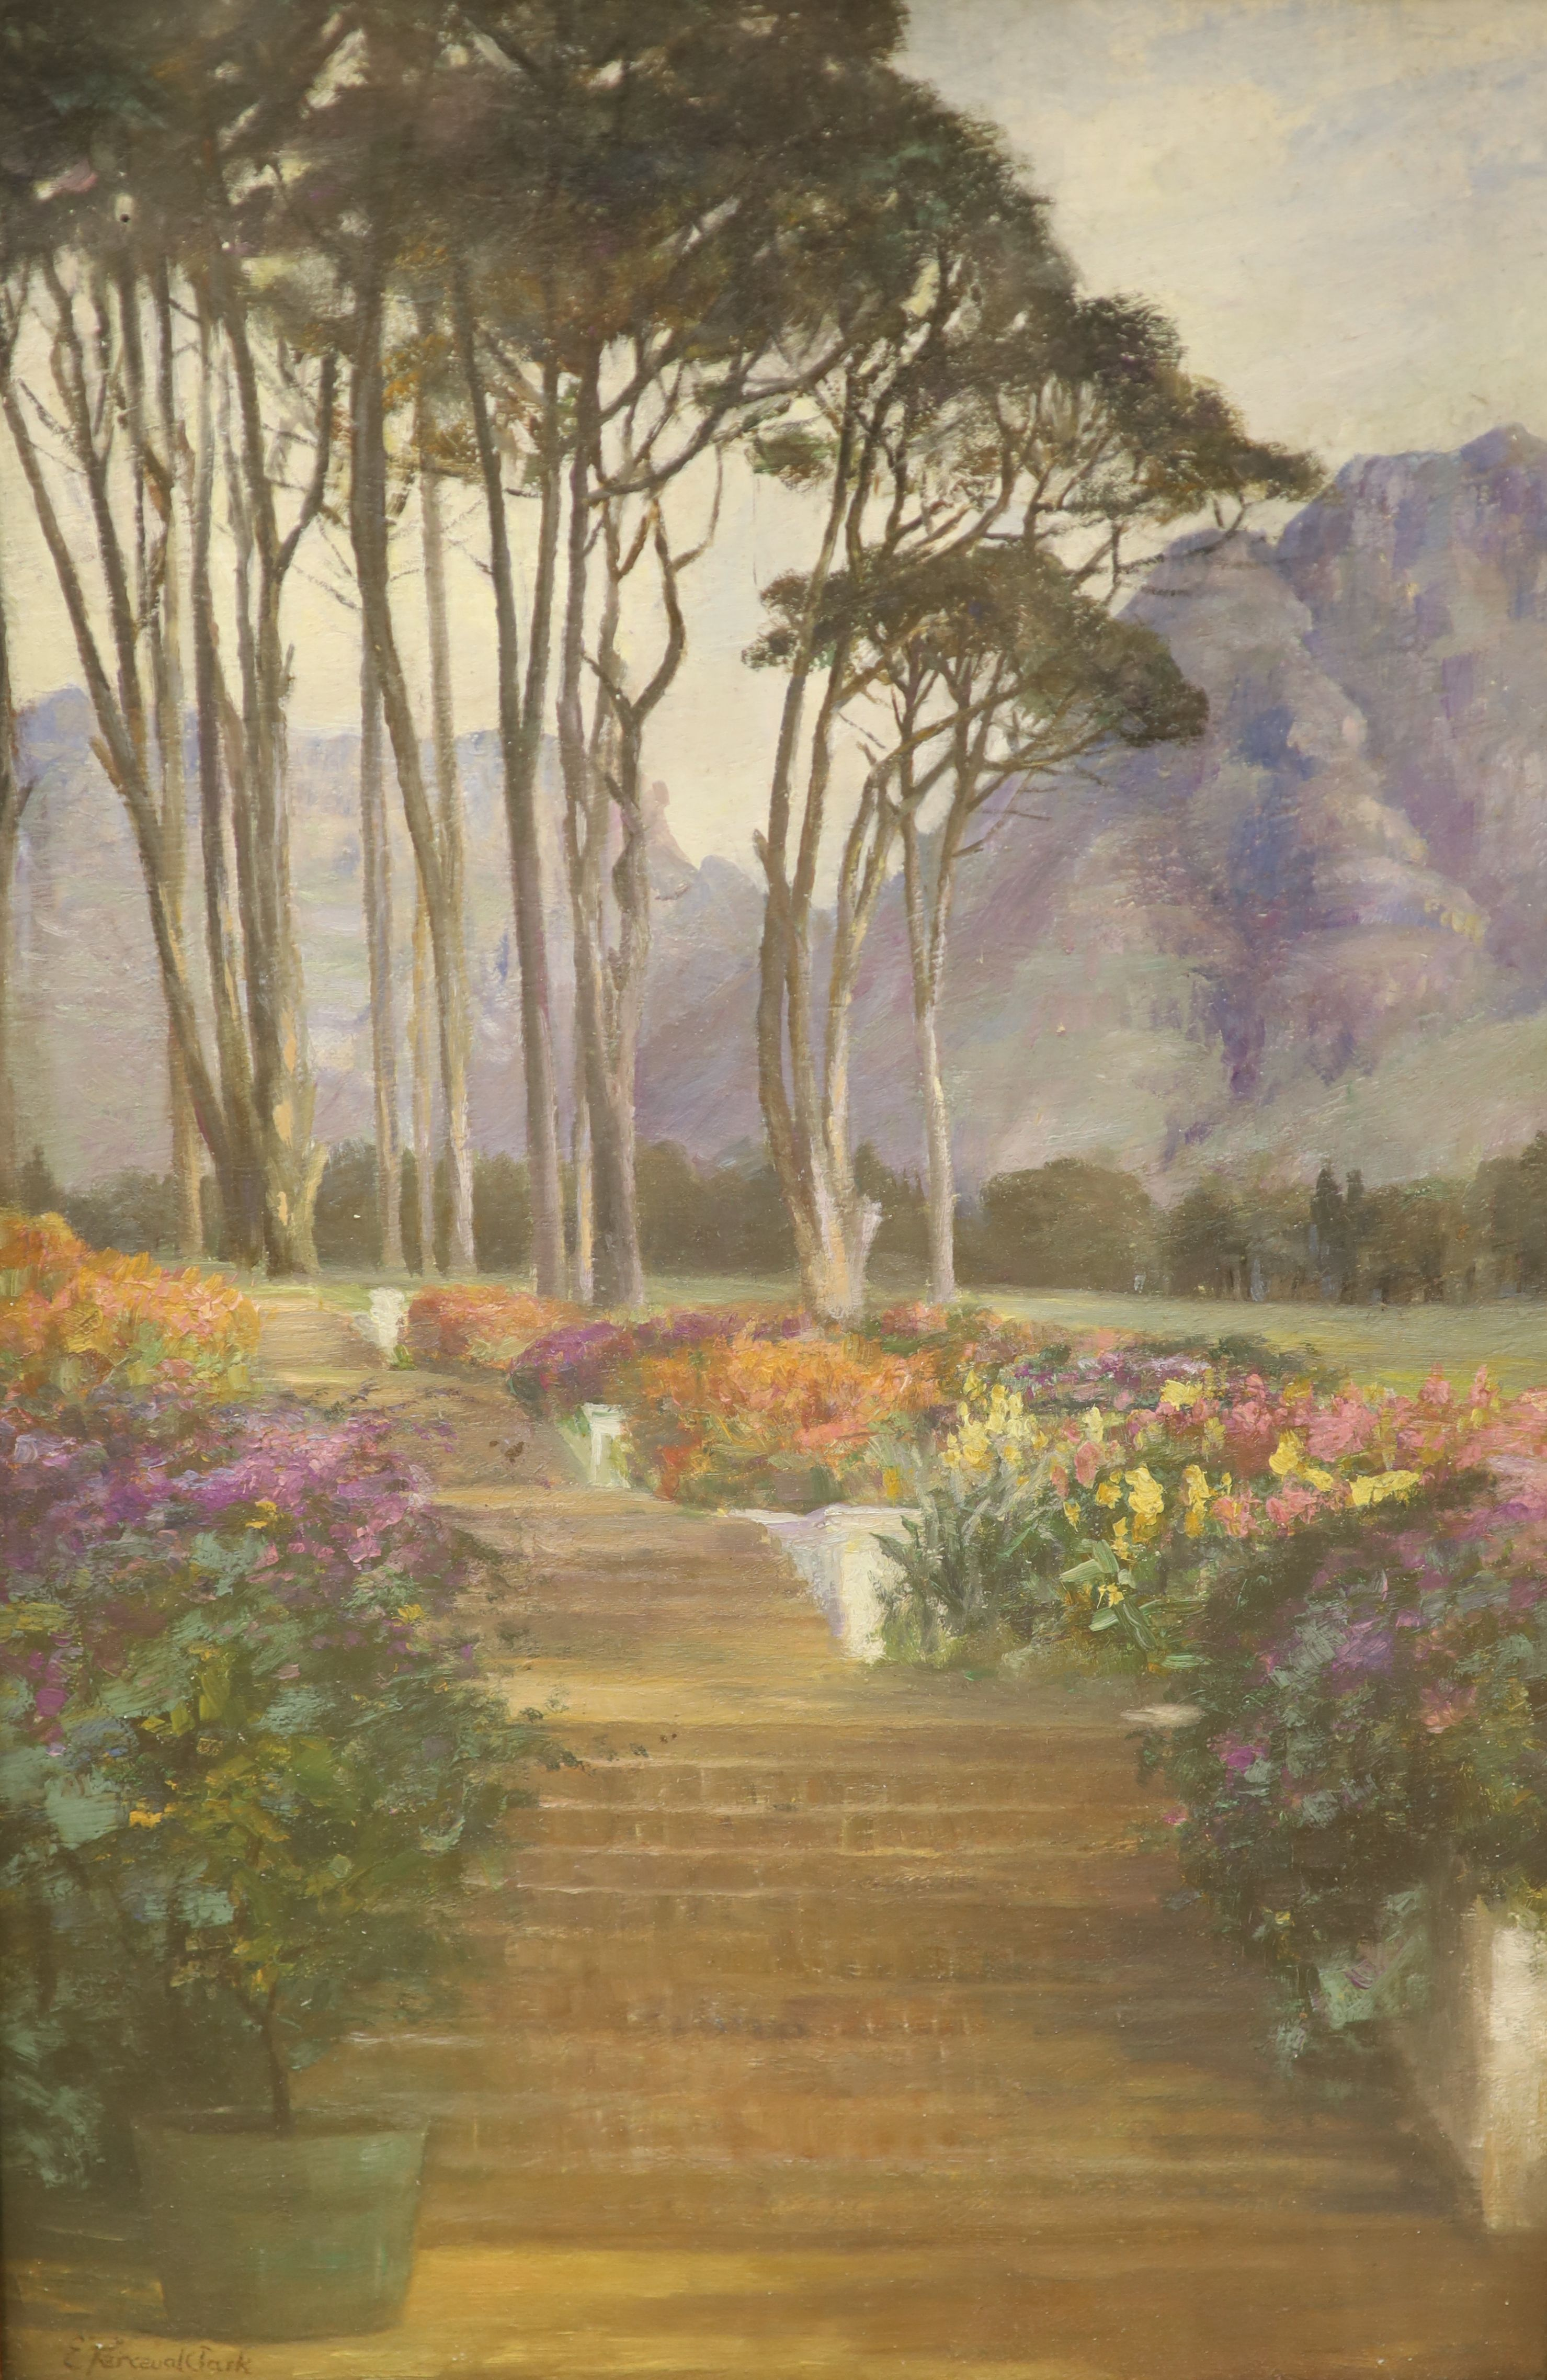 Evelyn Perceval-Clark, oil on board, The Terrace Garden, Groot, signed, 45 x 30cm